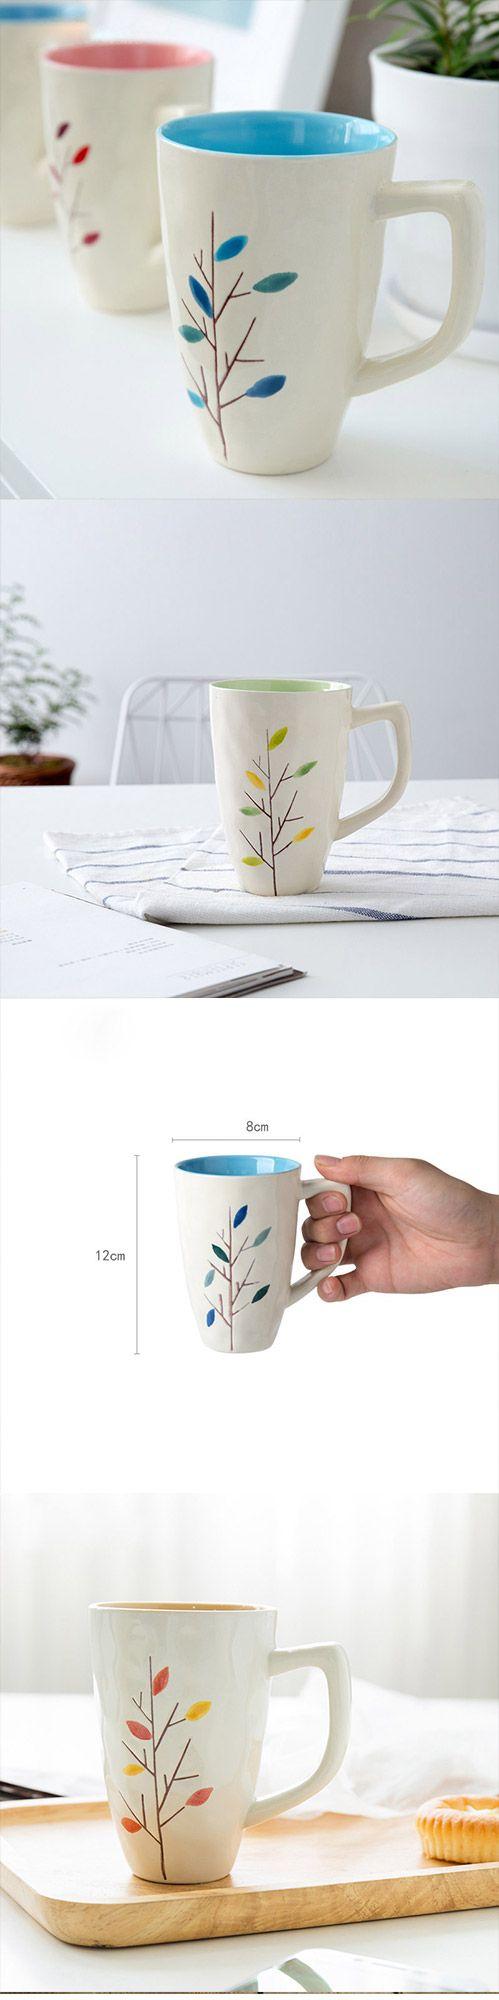 Handmade cute colorful tree oversized tea cup tall pottery funny coffee milk mug painted big large coffee cup ceramic vintage